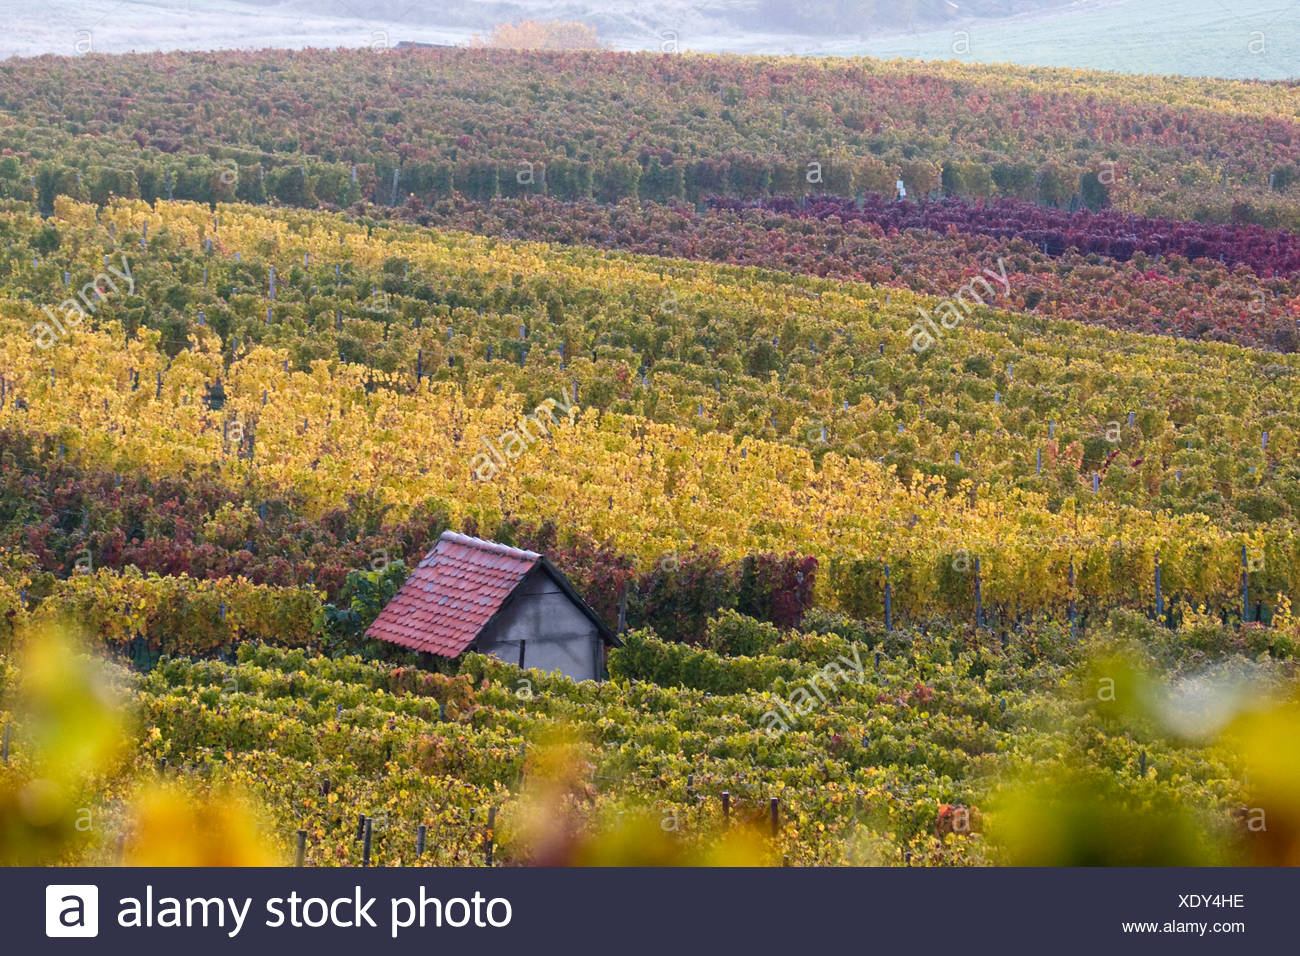 vineyard with vineyard house, Germany, Baden-Wuerttemberg, Ottilienberg, Heuchelberg, Kleingartach Stock Photo